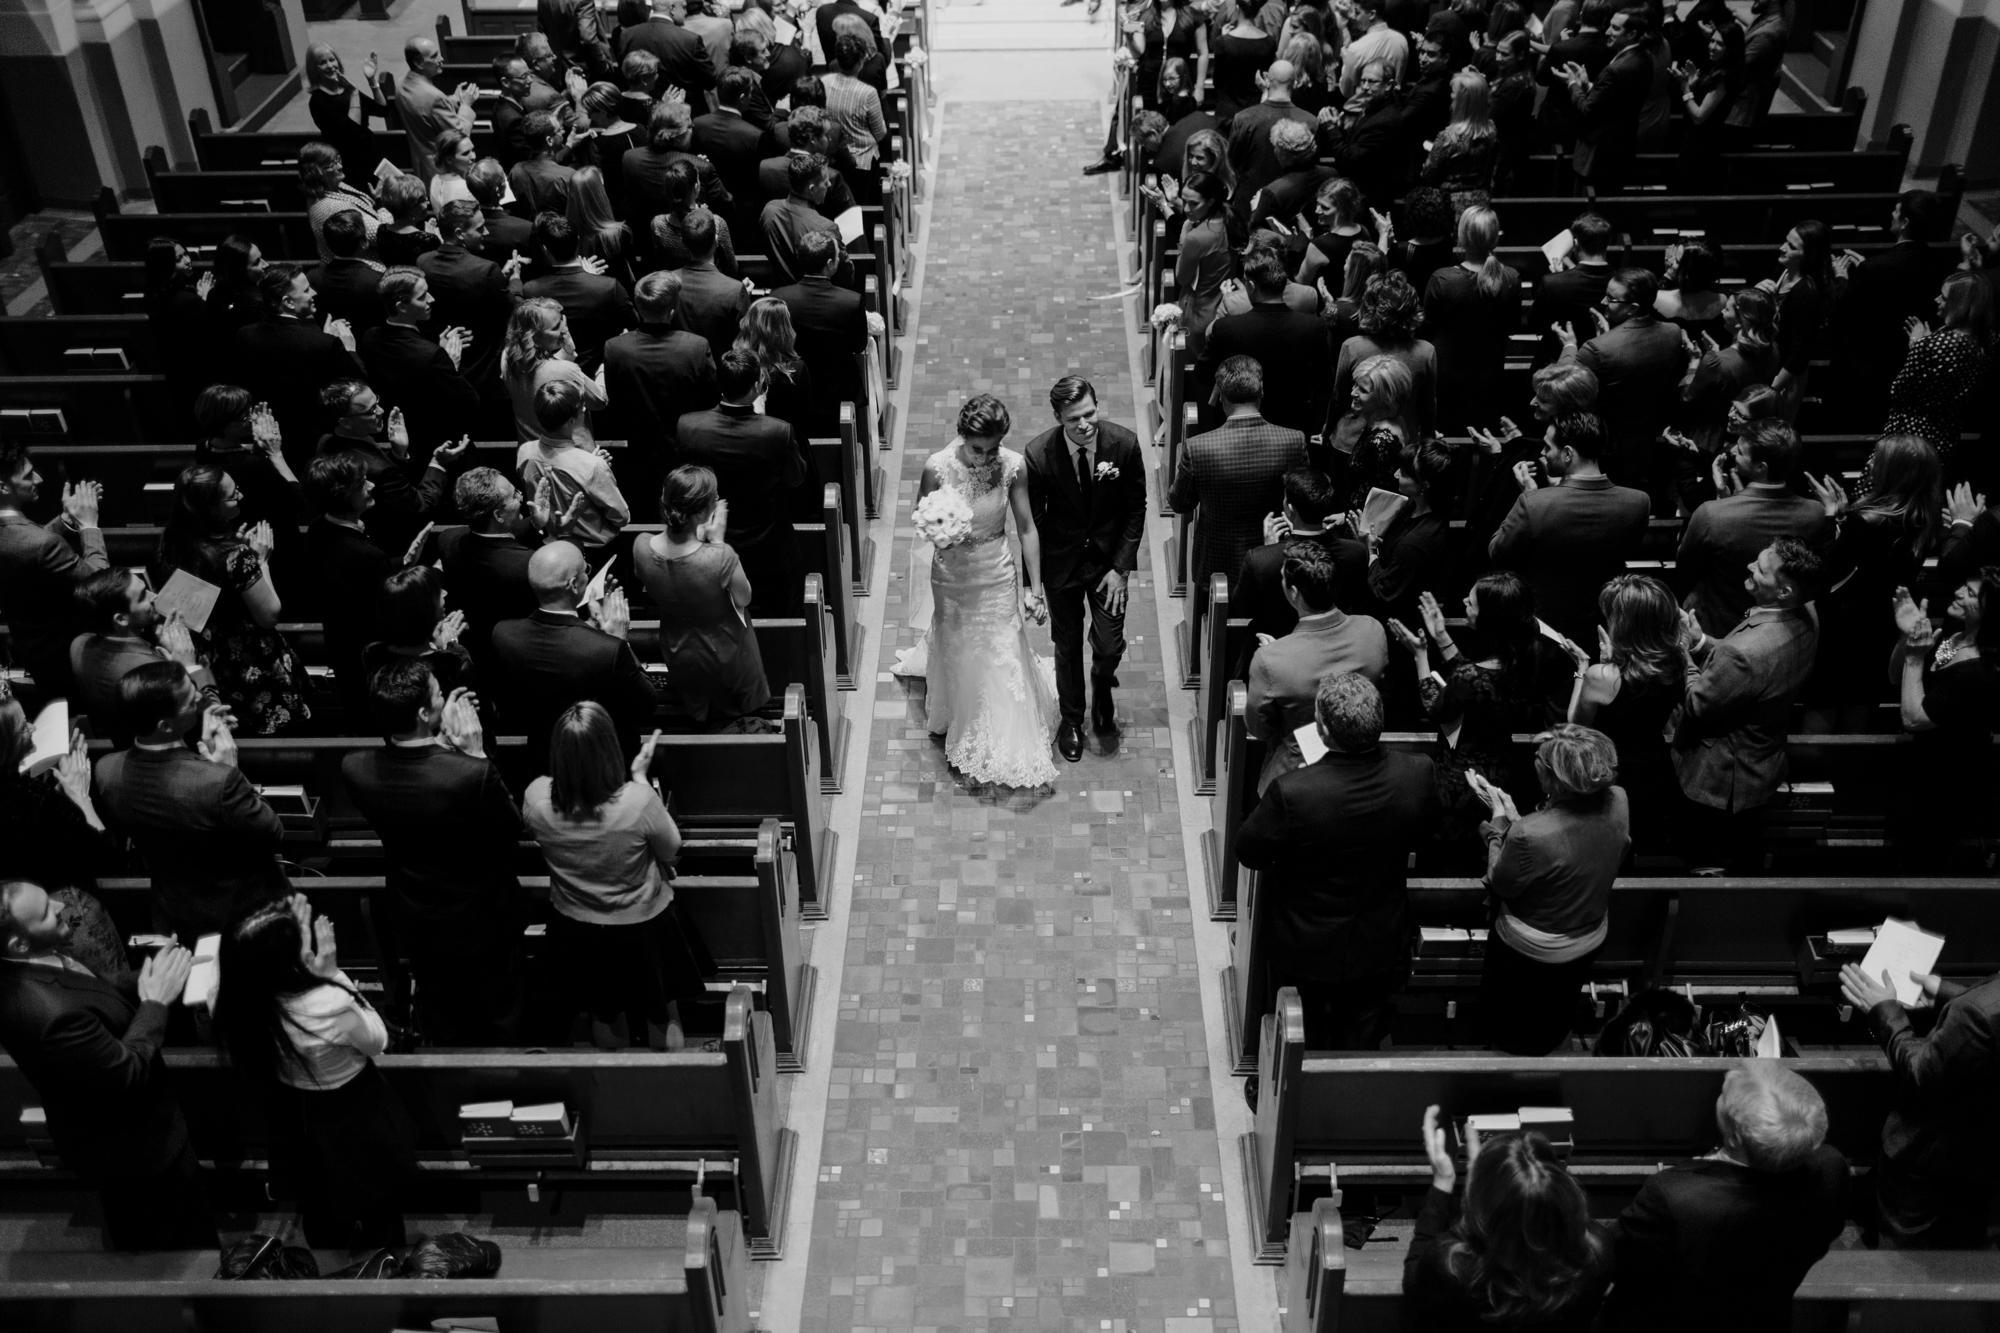 Nicollet-Island-Pavilion-Winter-Wedding-Minneapolis_37.jpg